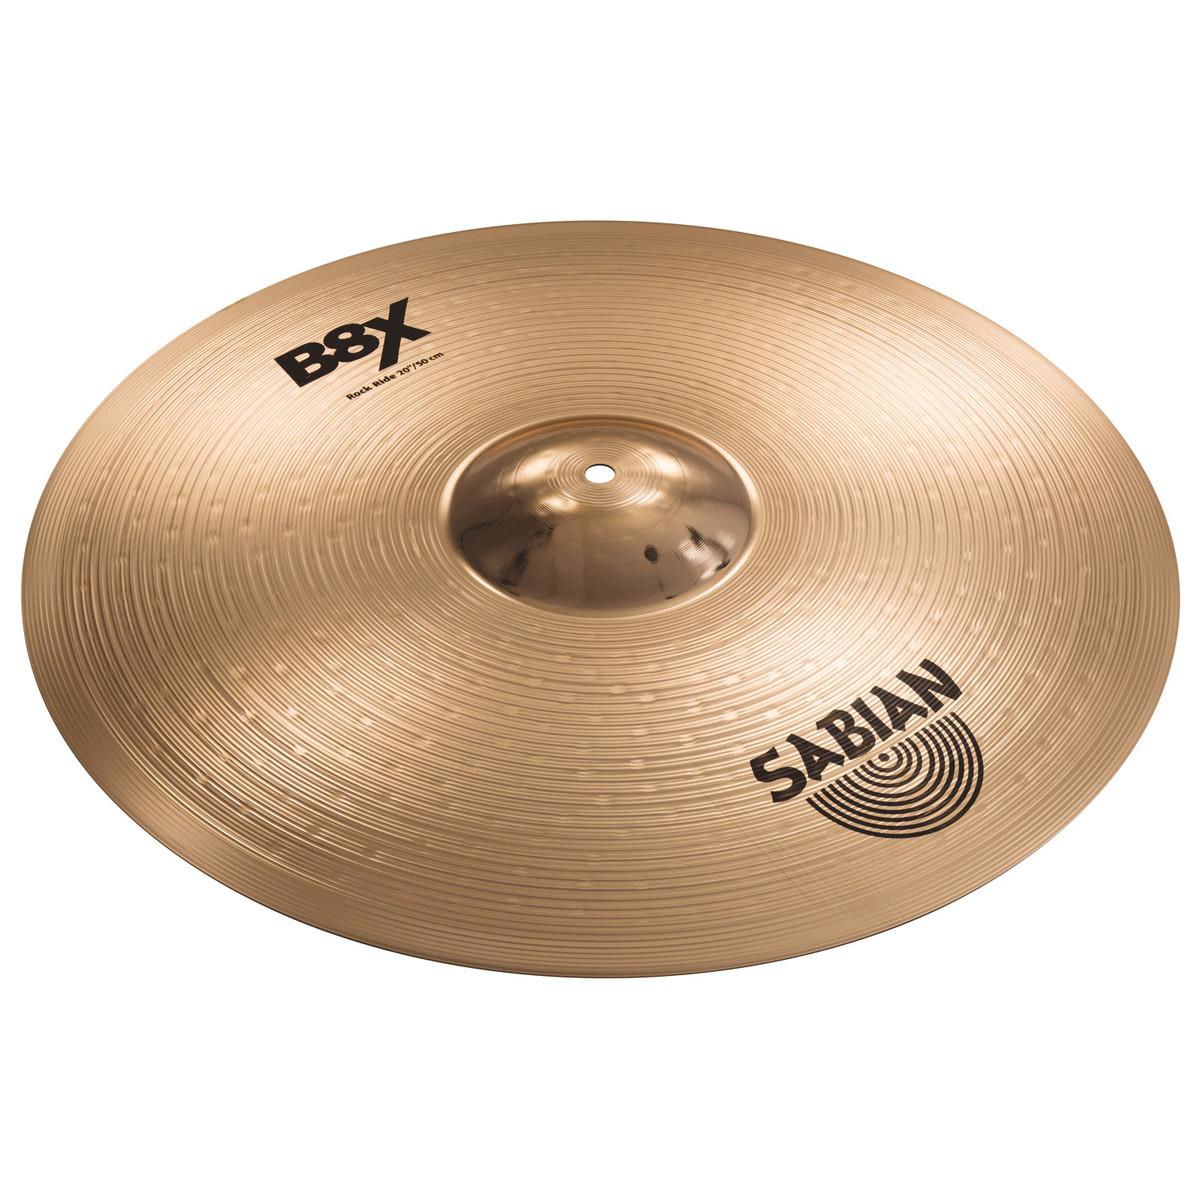 sabian b8x 21 39 39 rock ride cymbal at gear4music. Black Bedroom Furniture Sets. Home Design Ideas